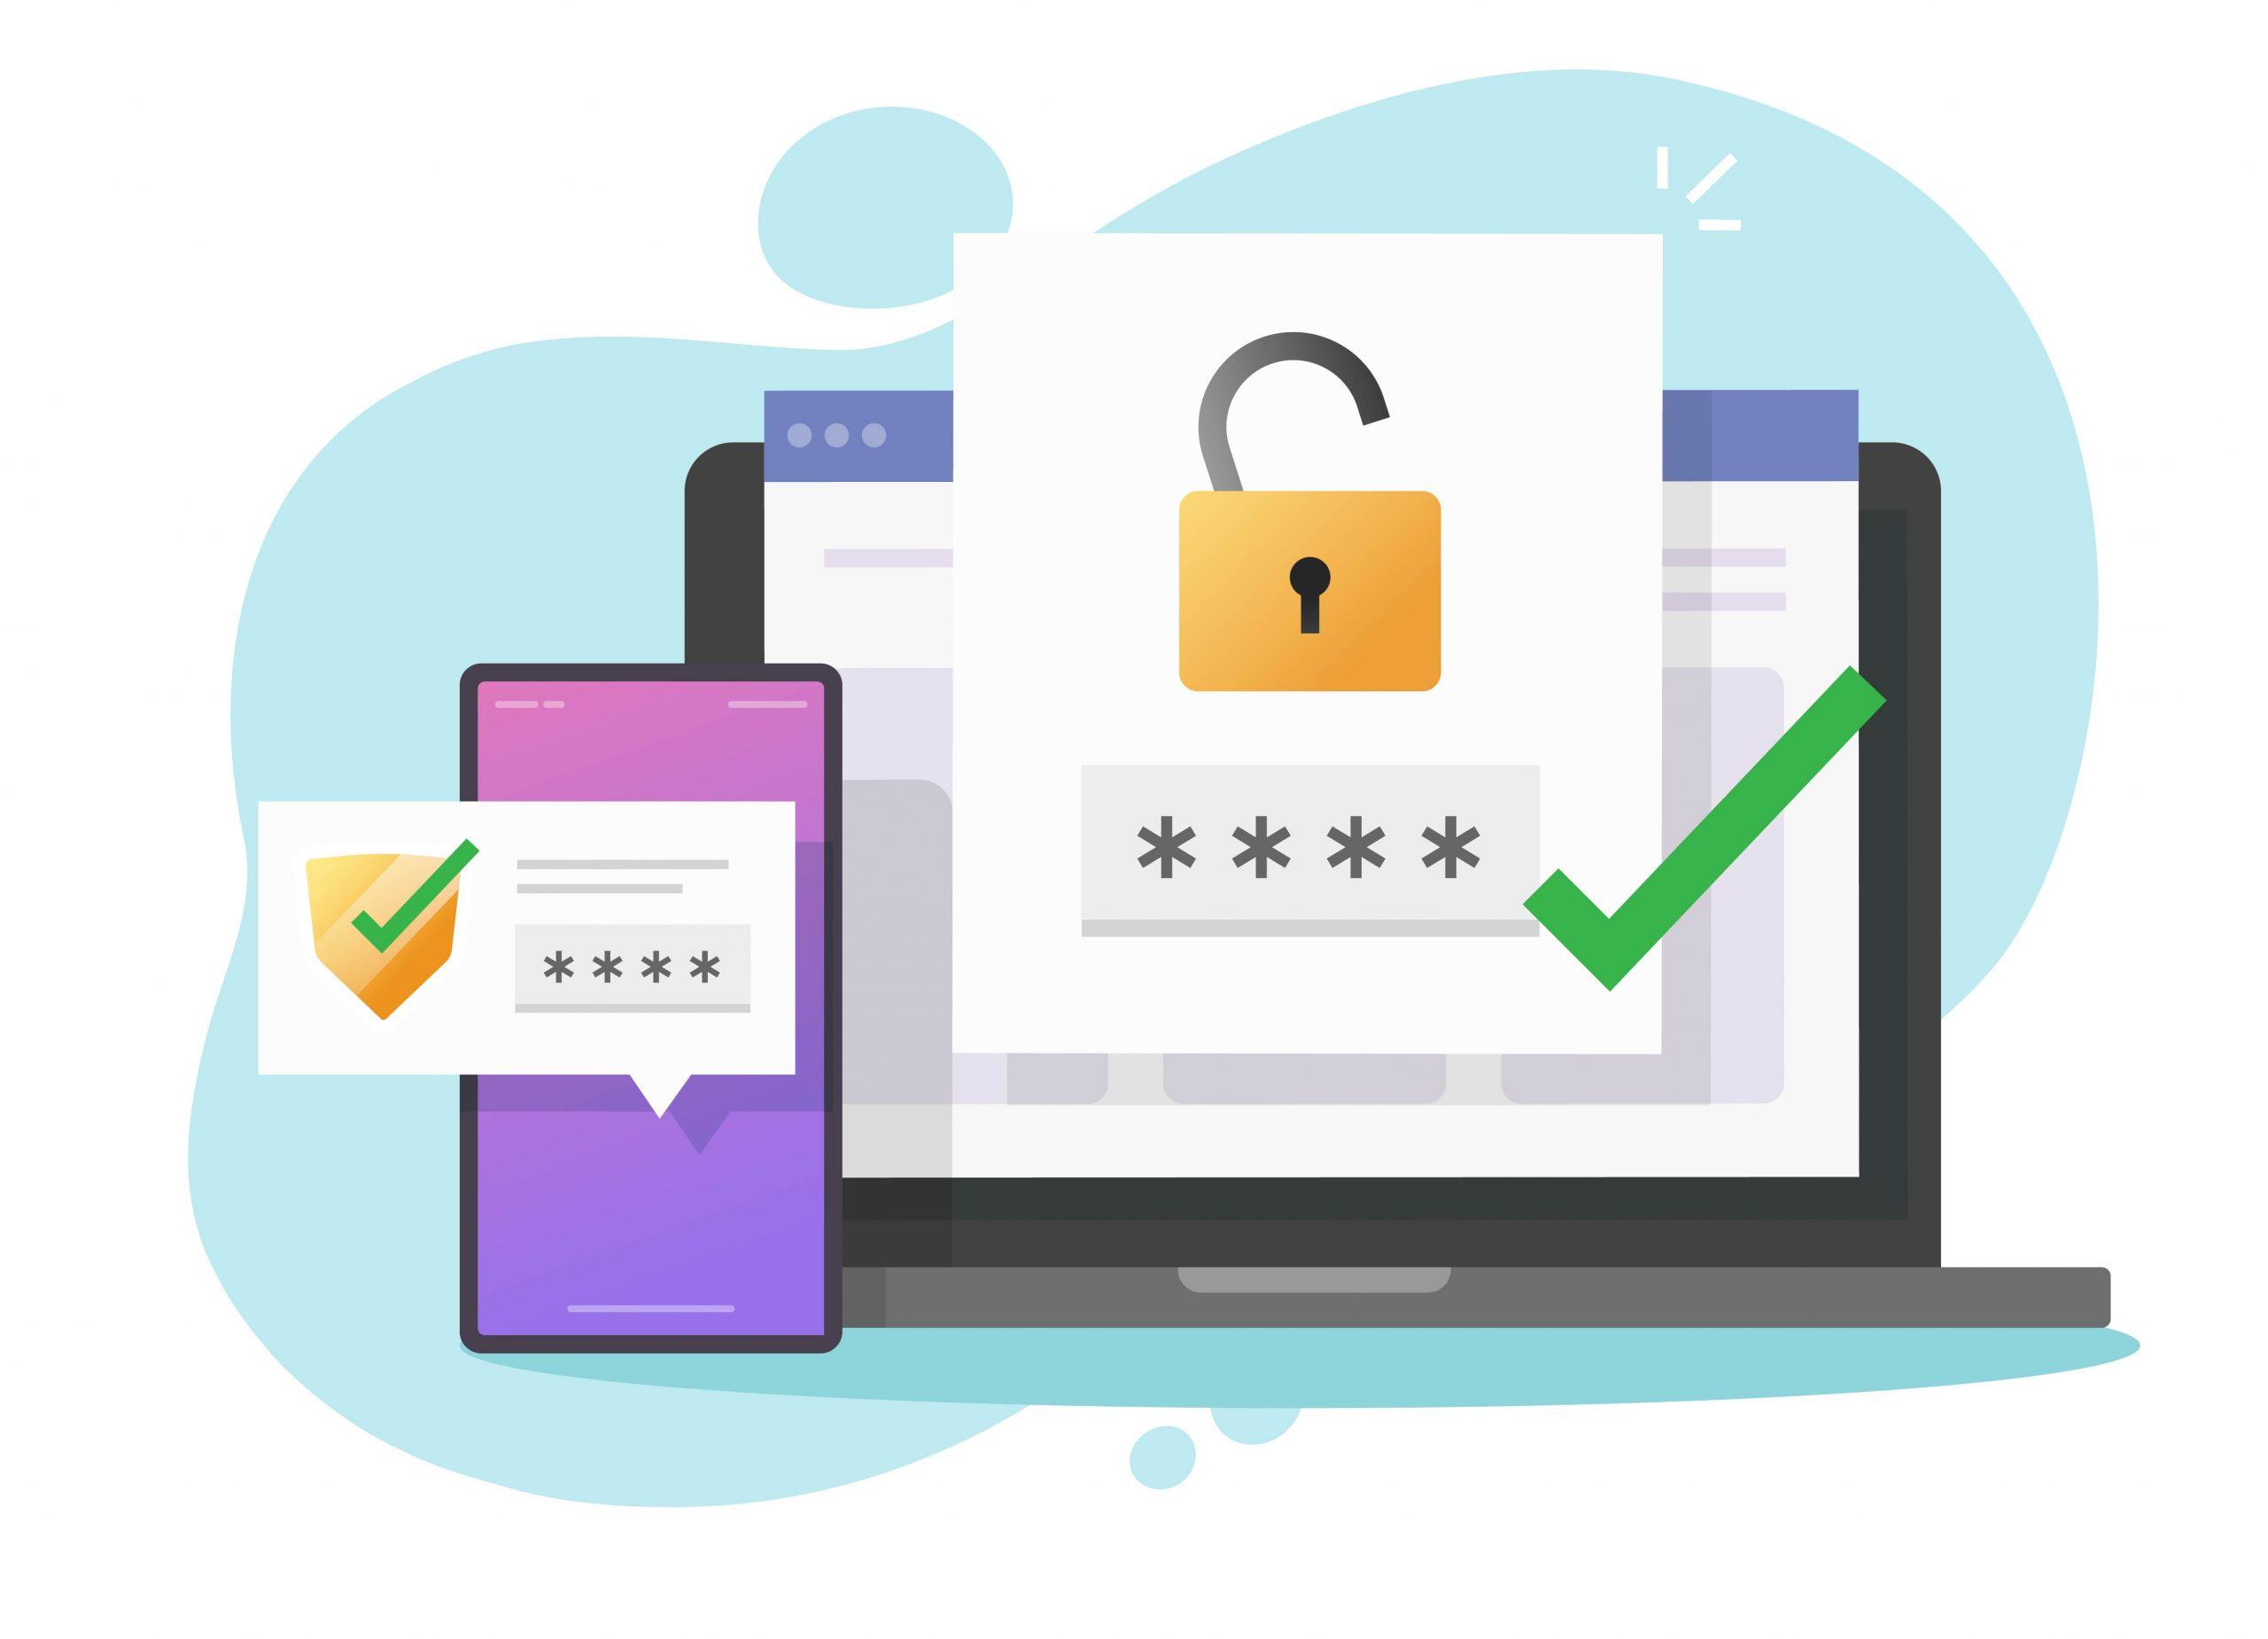 2fa MFA multi factor authentication password secure login verification or sms